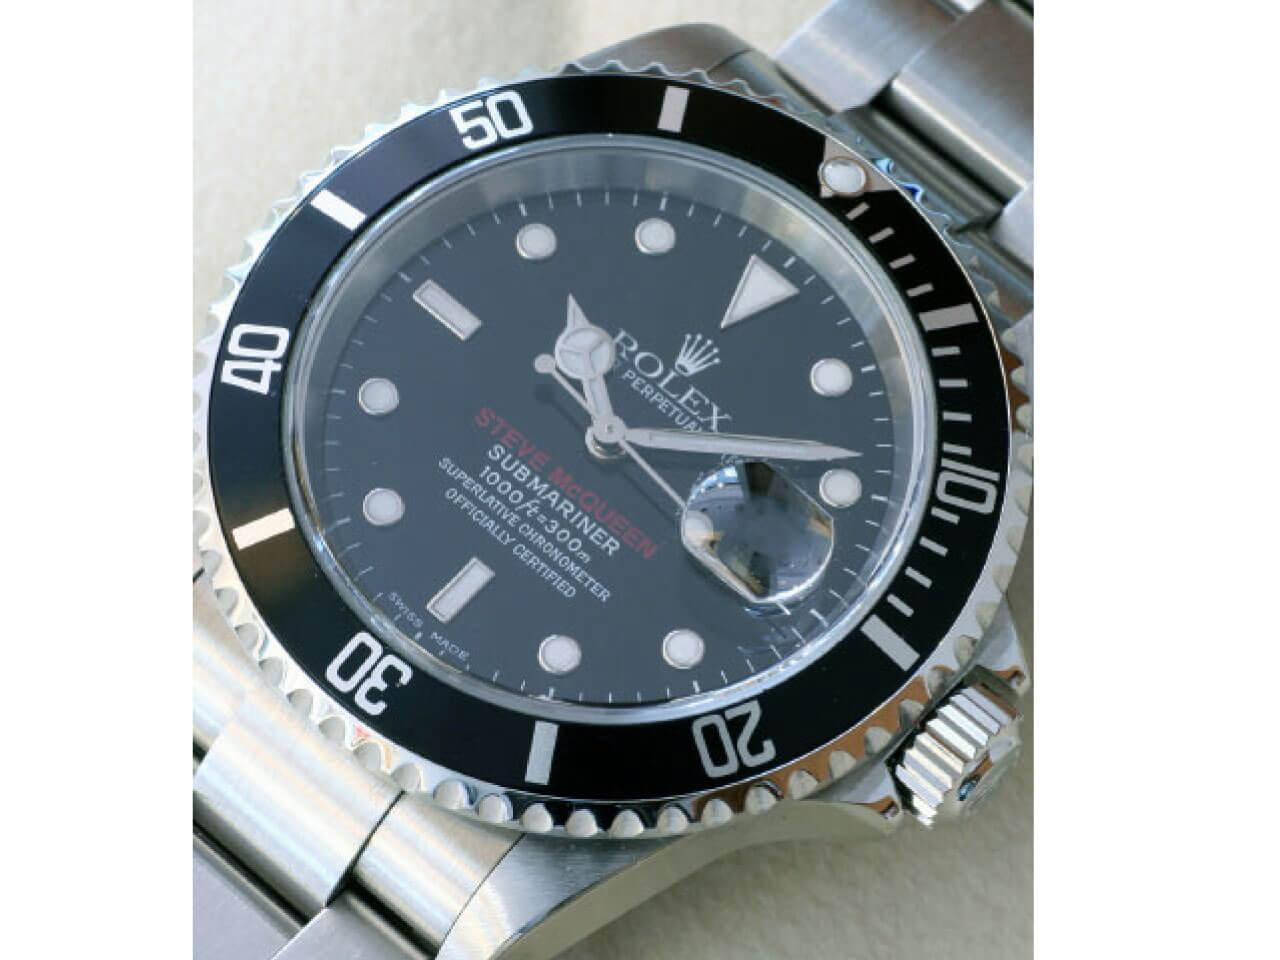 "660ebacac3 ロレックス(Rolex)のサブマリーナ(Submariner)16610 ""STEVE McQUEEN"""